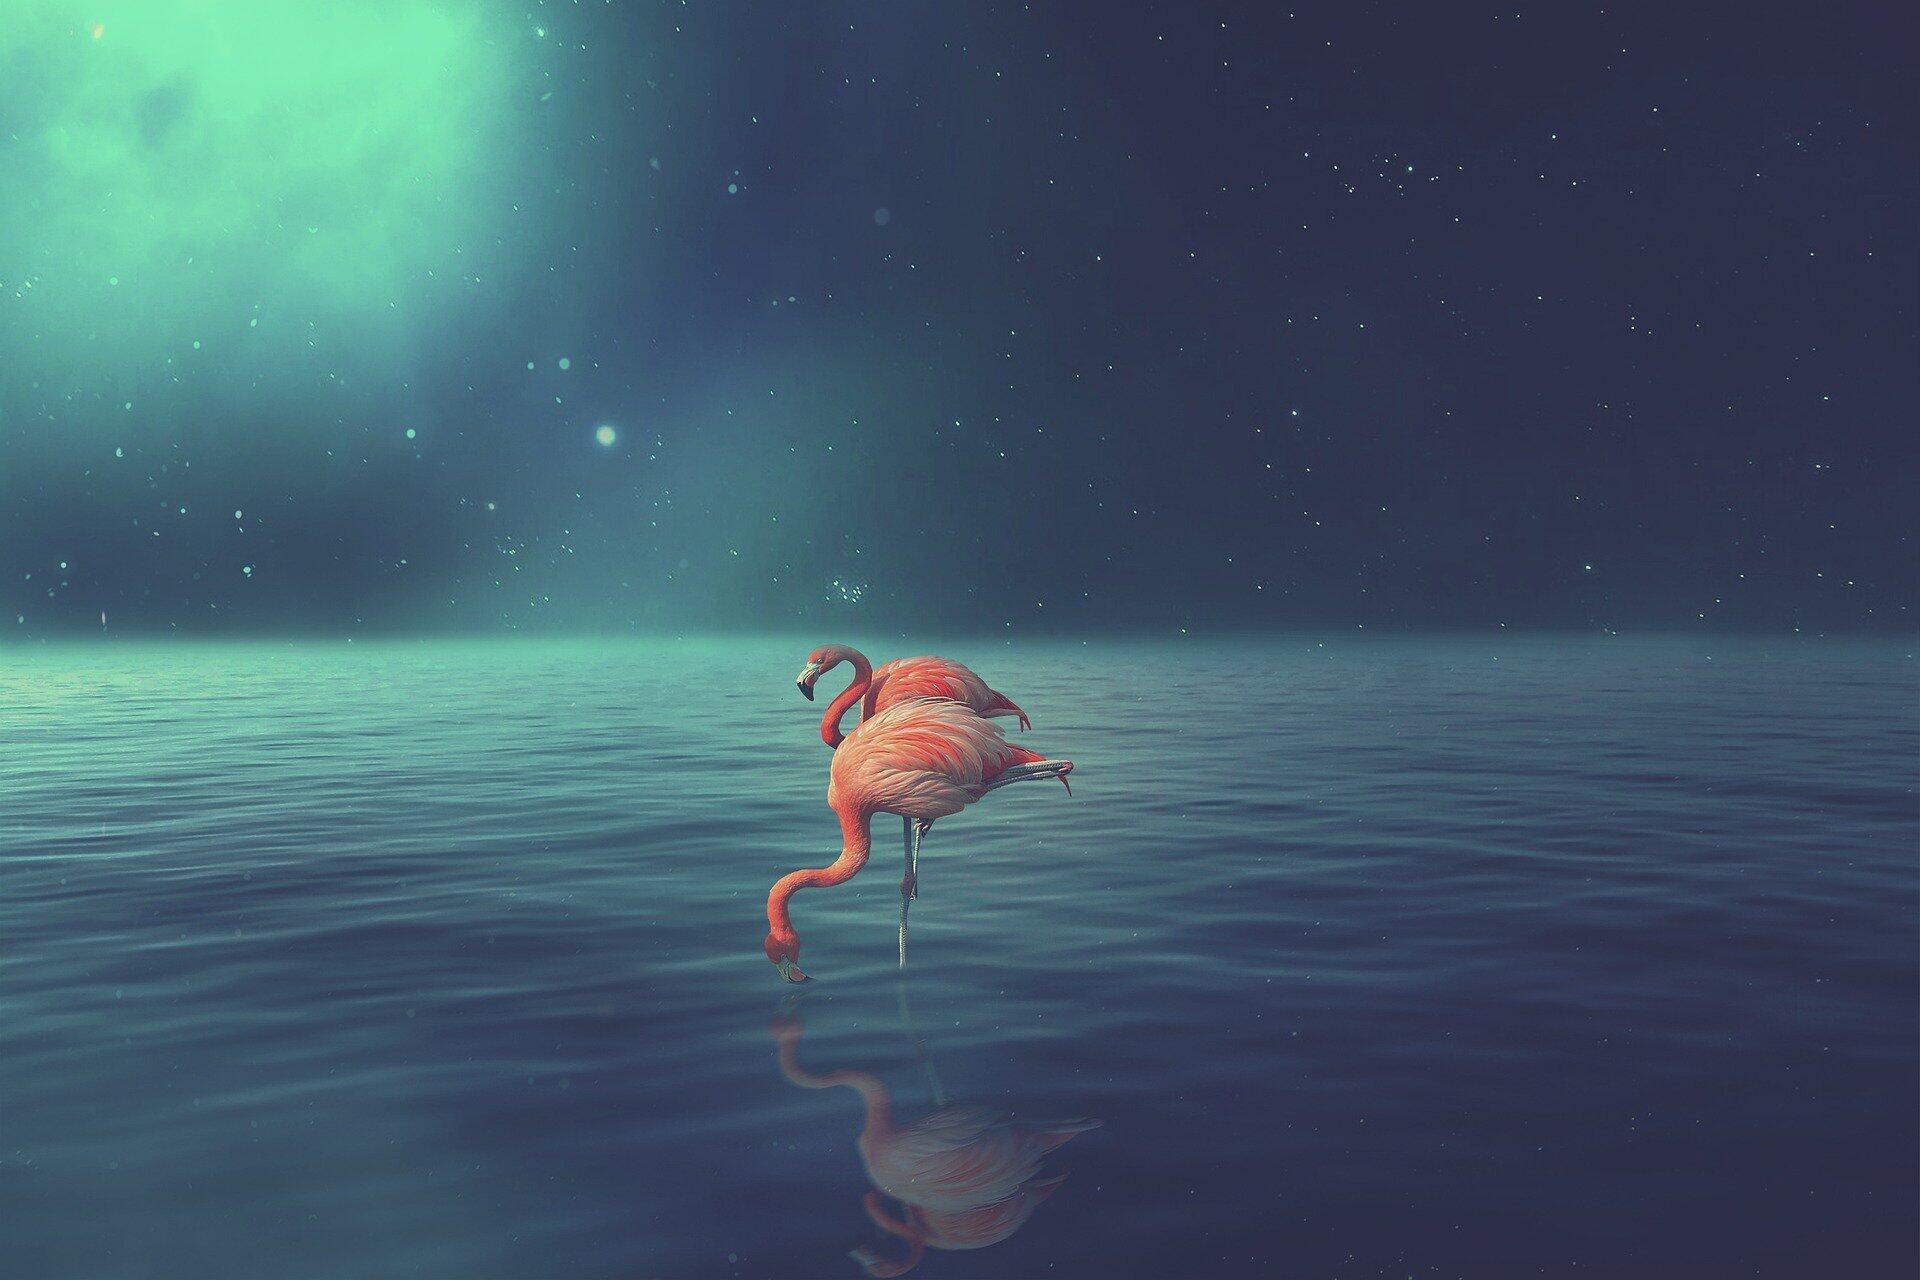 BigBird会是 NLP 的另一个重要里程碑吗?